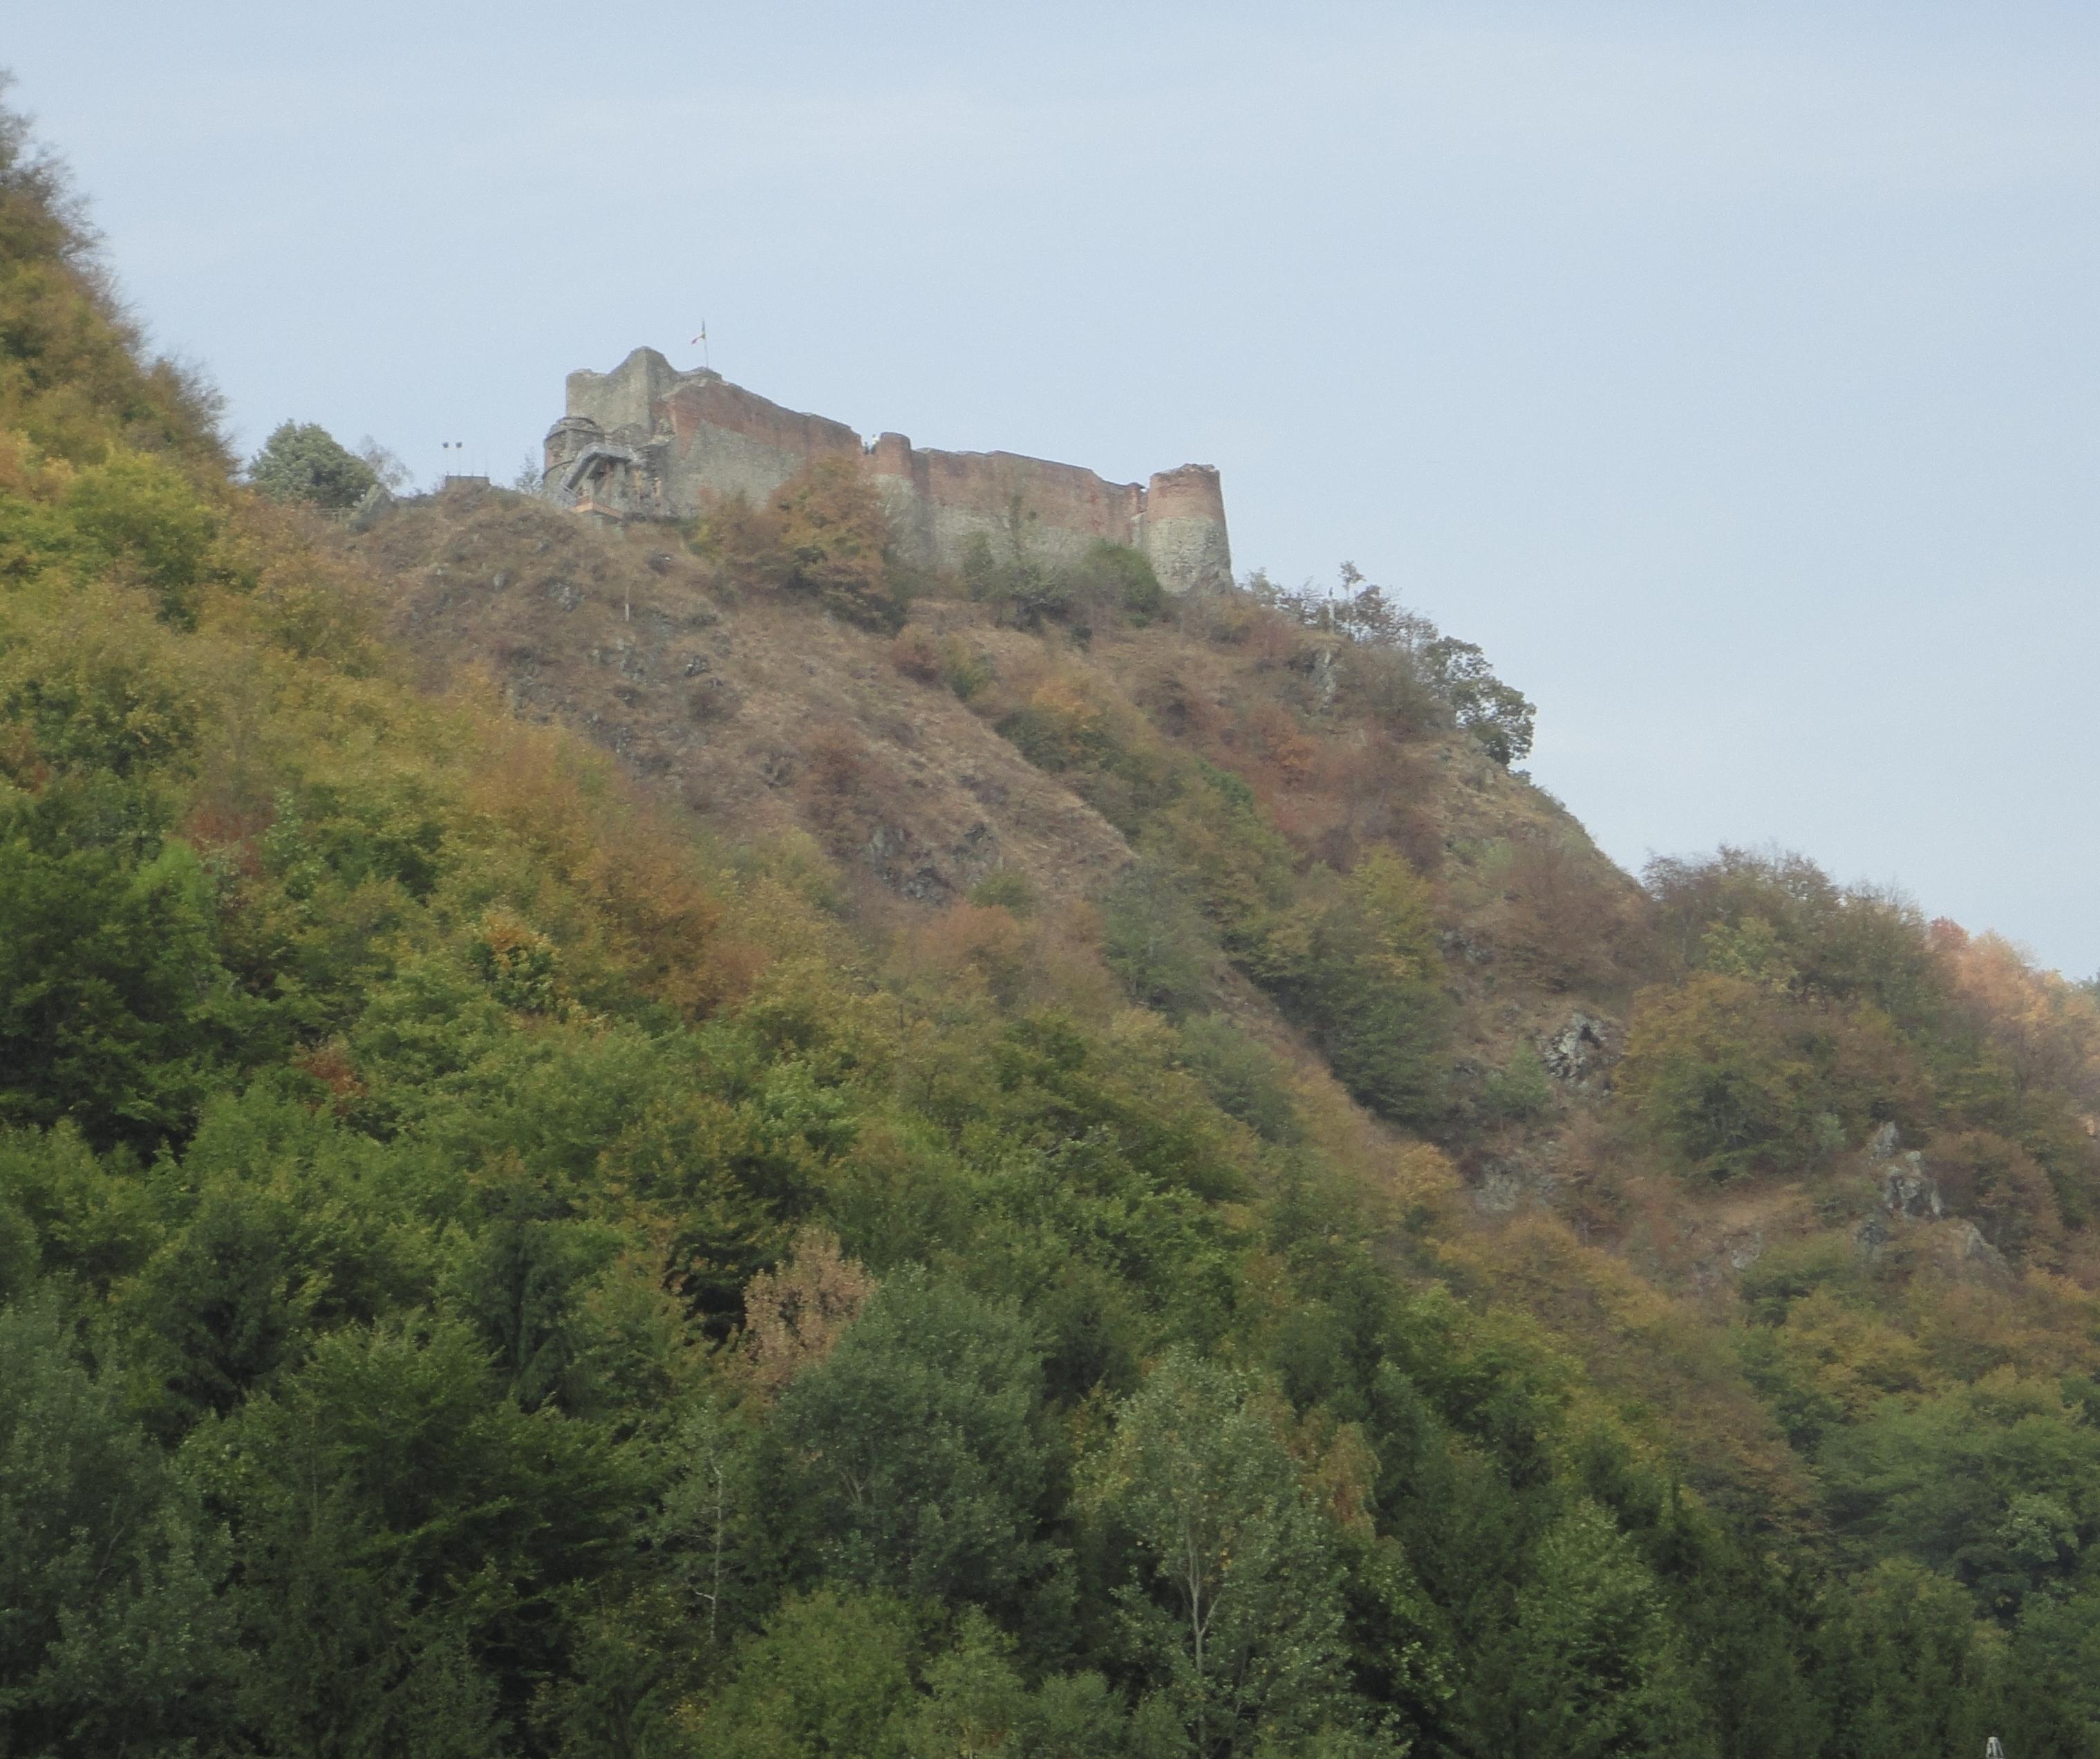 File:Poenari castle.jpg - Wikimedia Commons